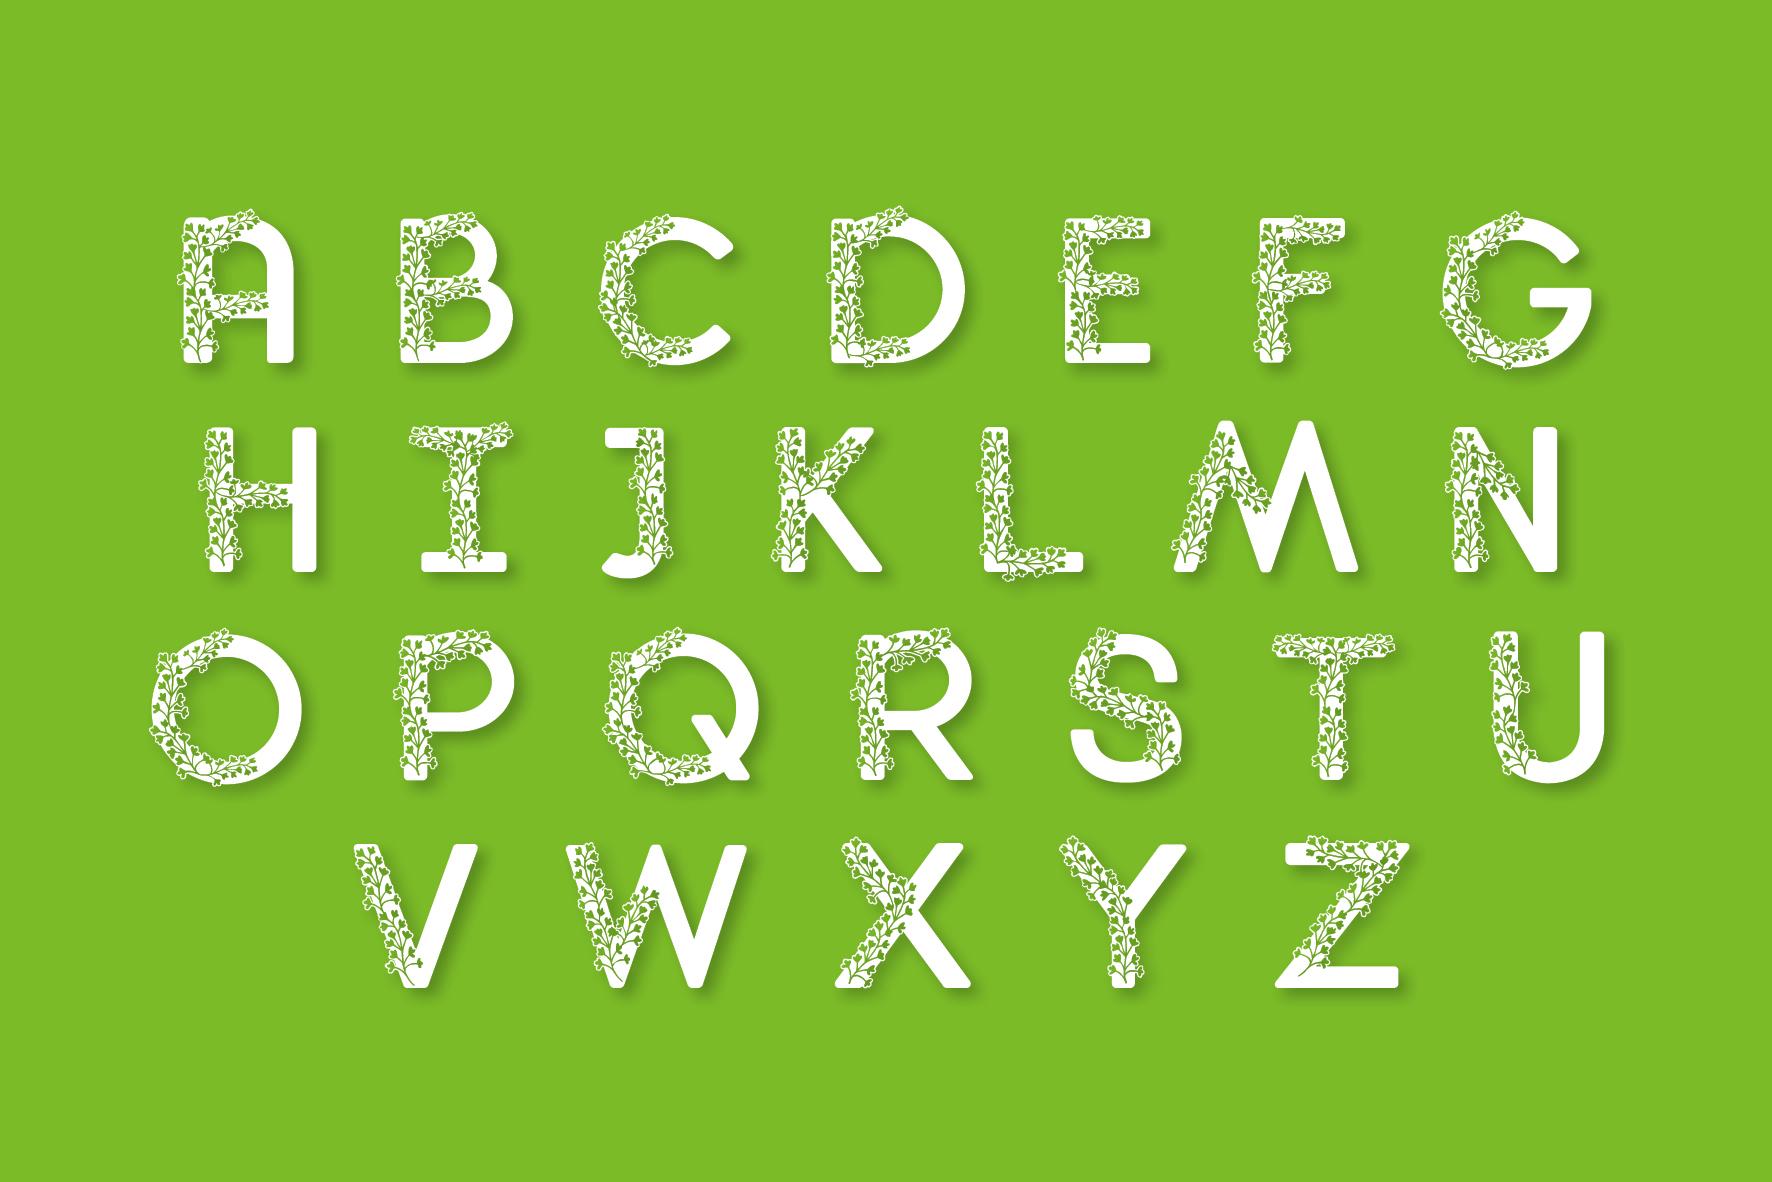 Diamanda Font Family Bundle includes 6 crafting fonts example image 4